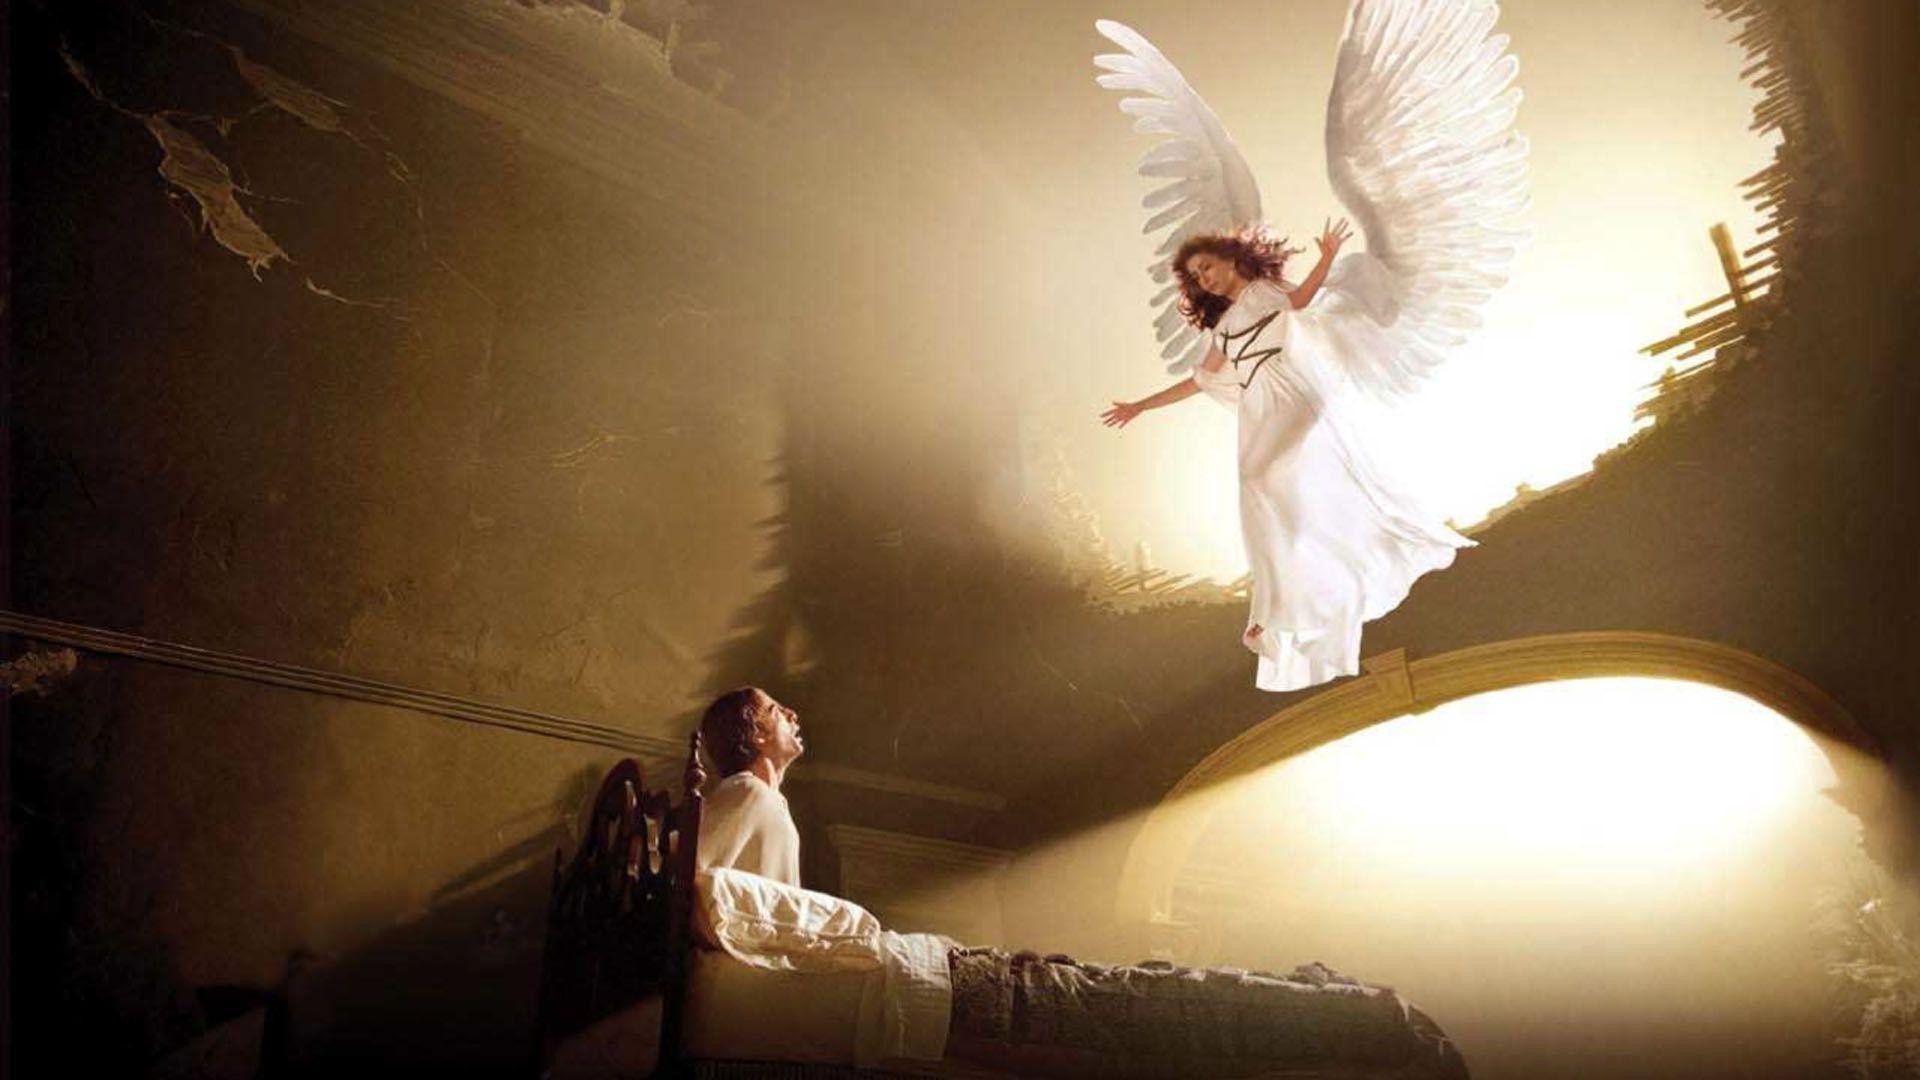 angels in america movie still